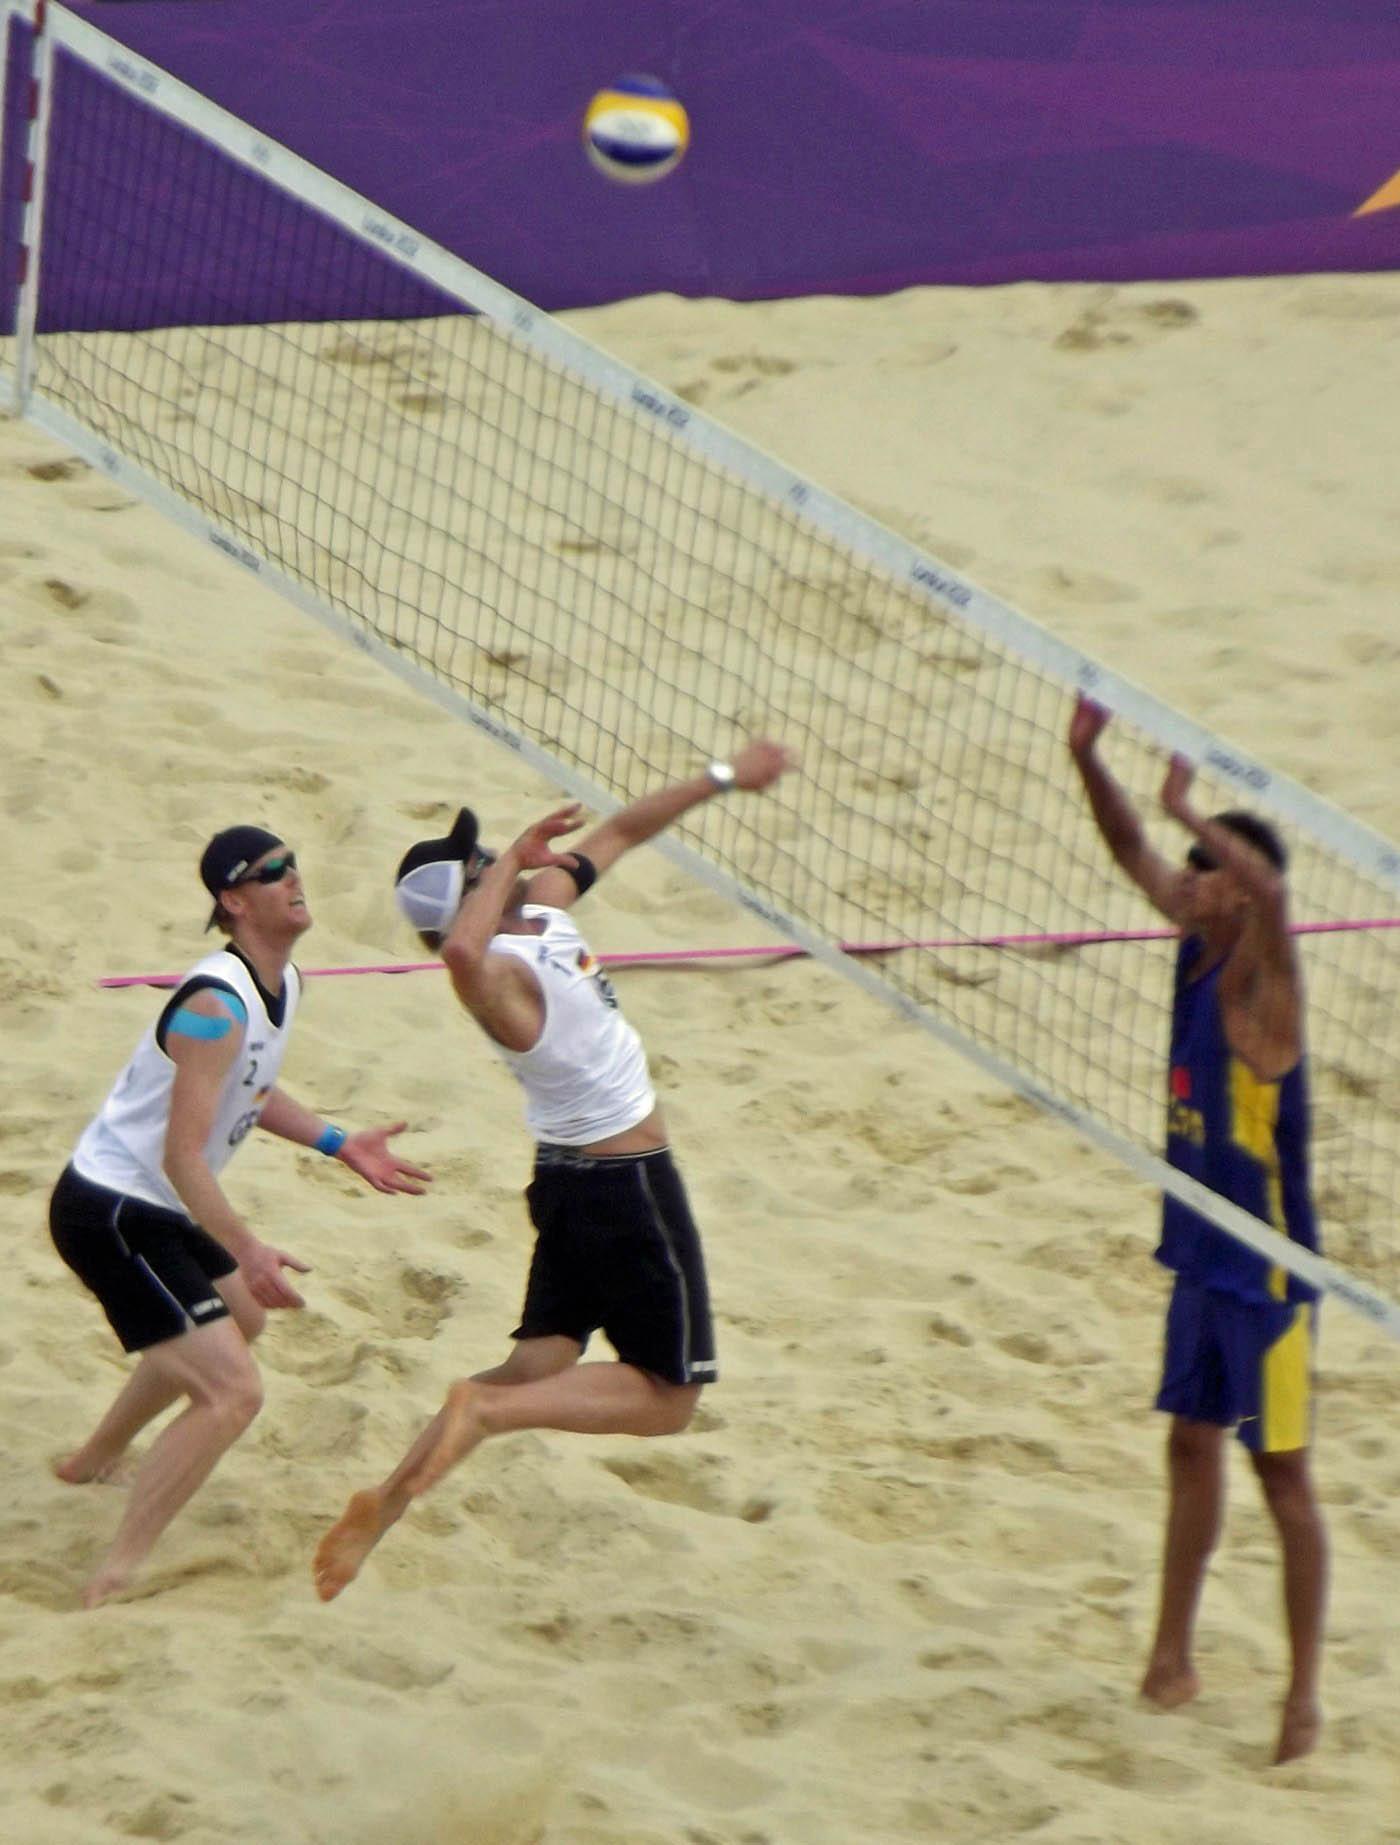 Three men playing beach volleyball